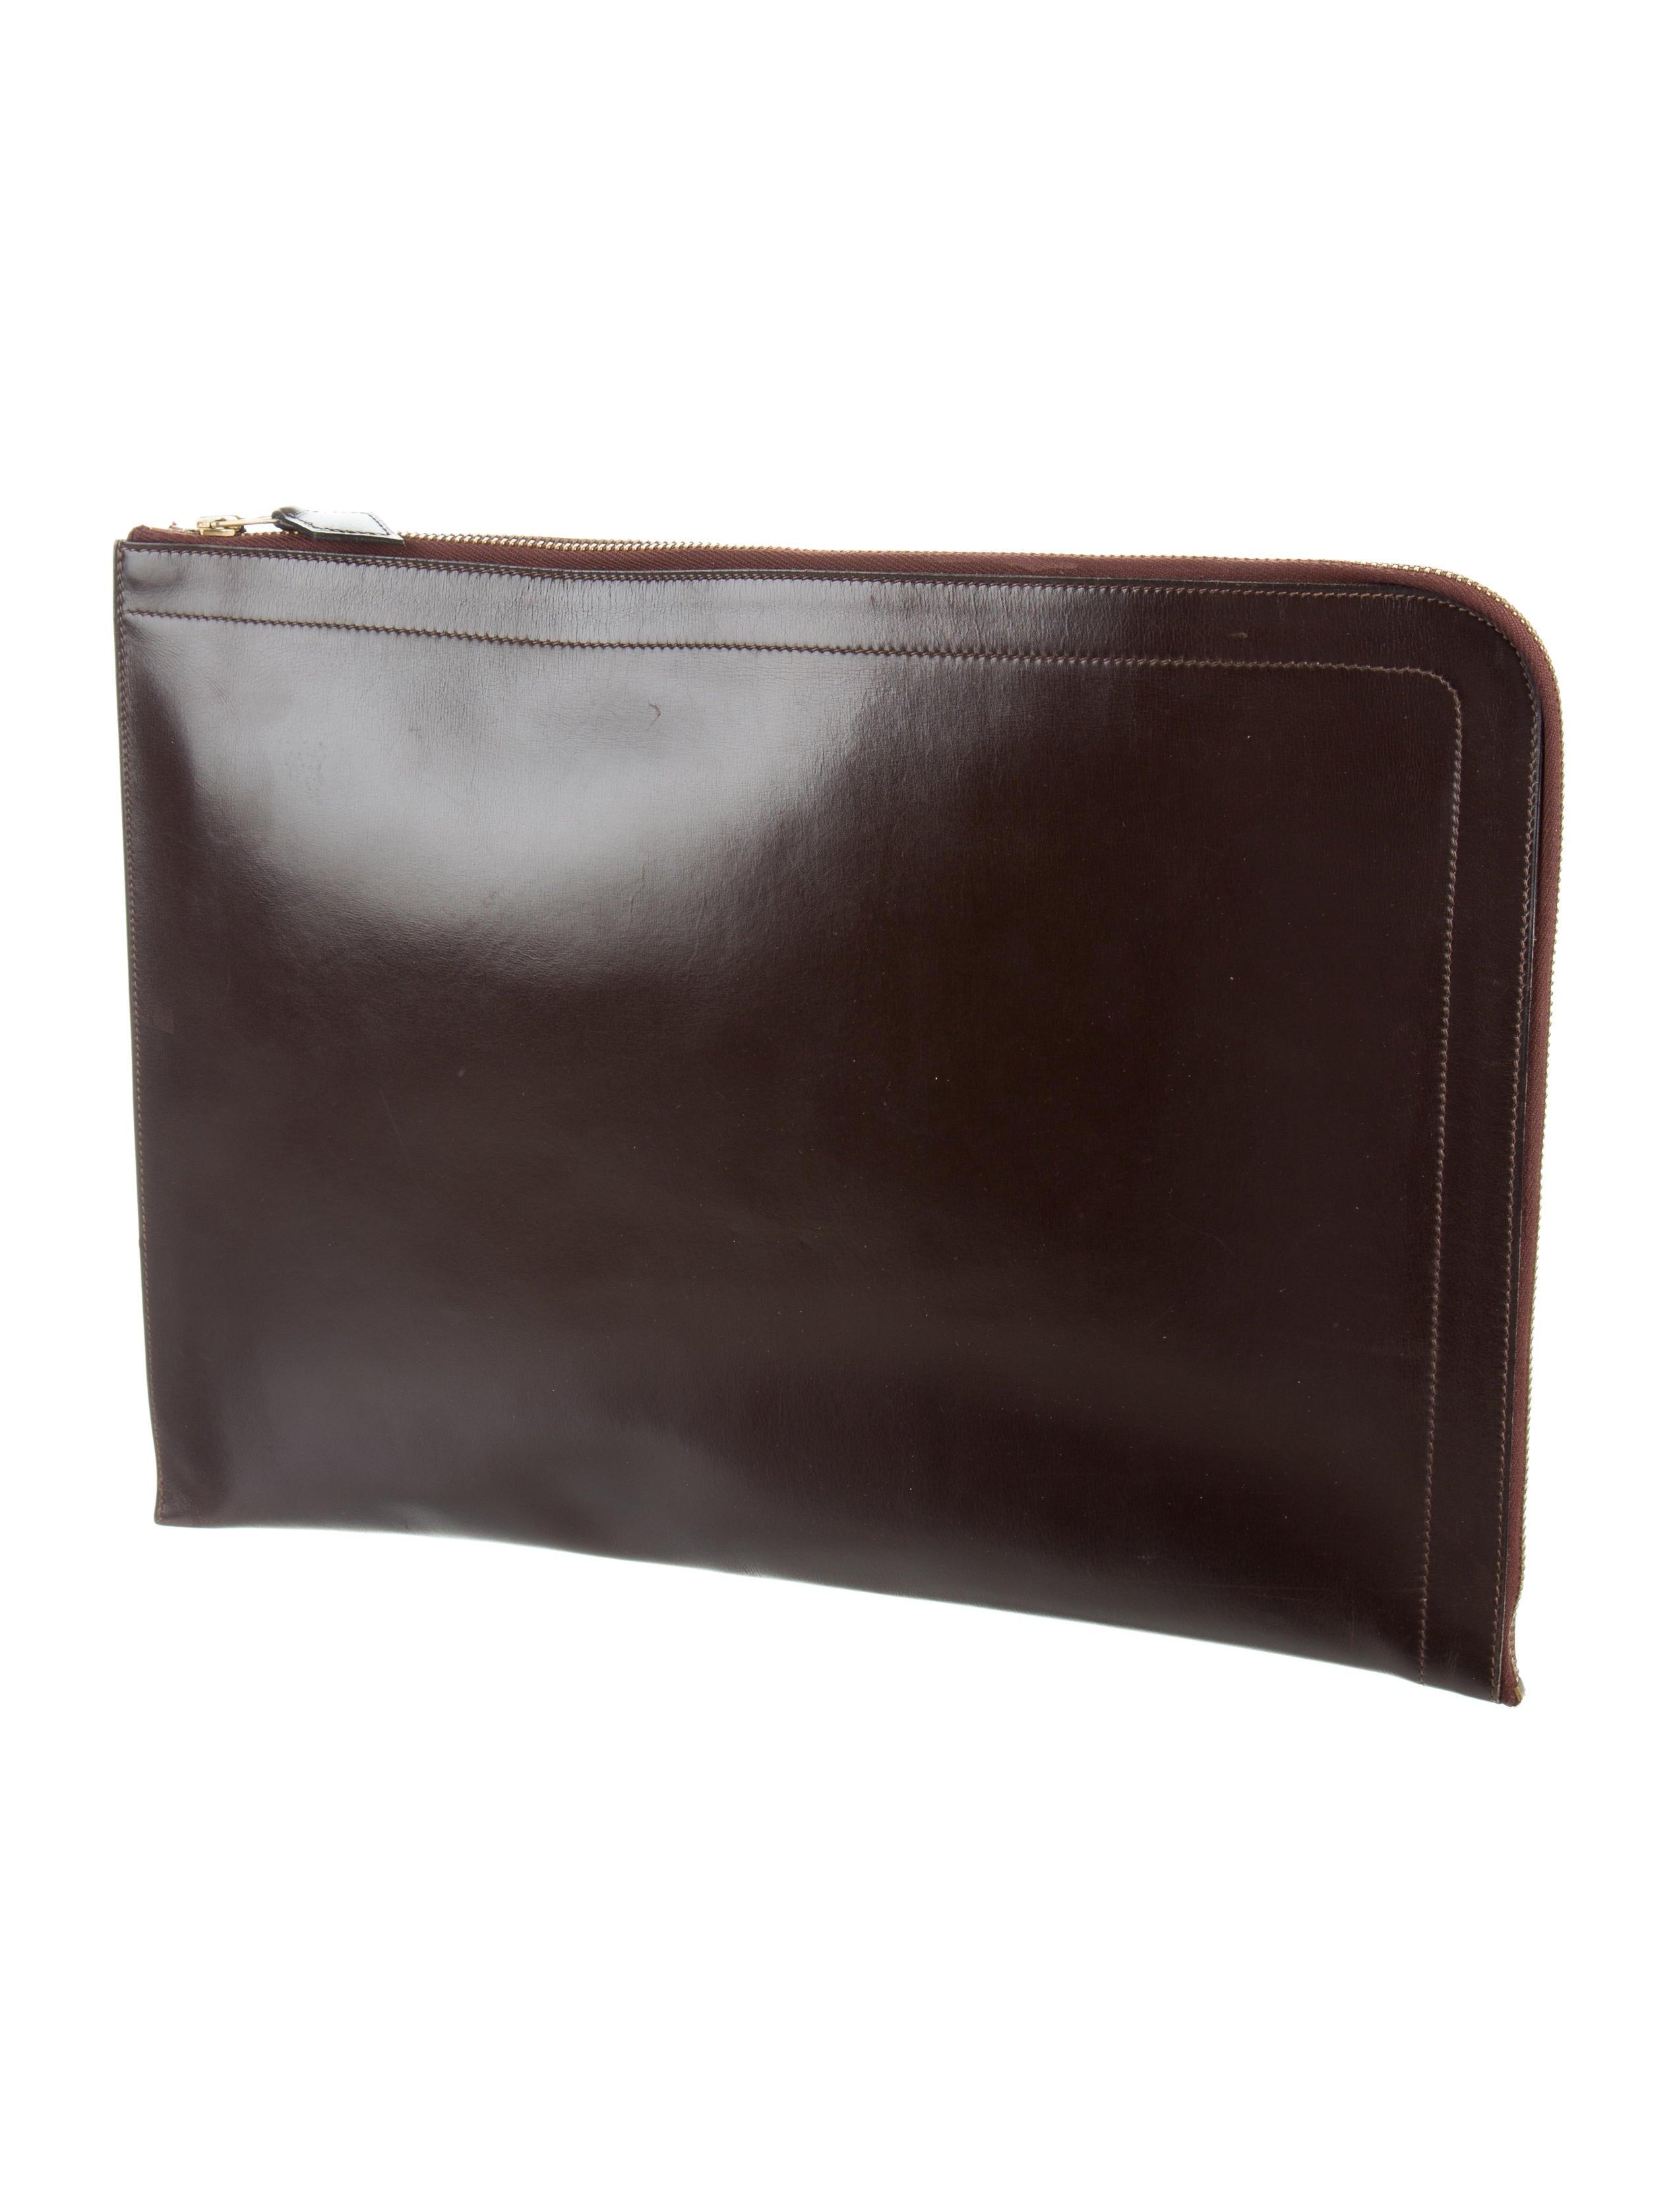 Hermes zip document holder bags her97440 the realreal for Document holder bag